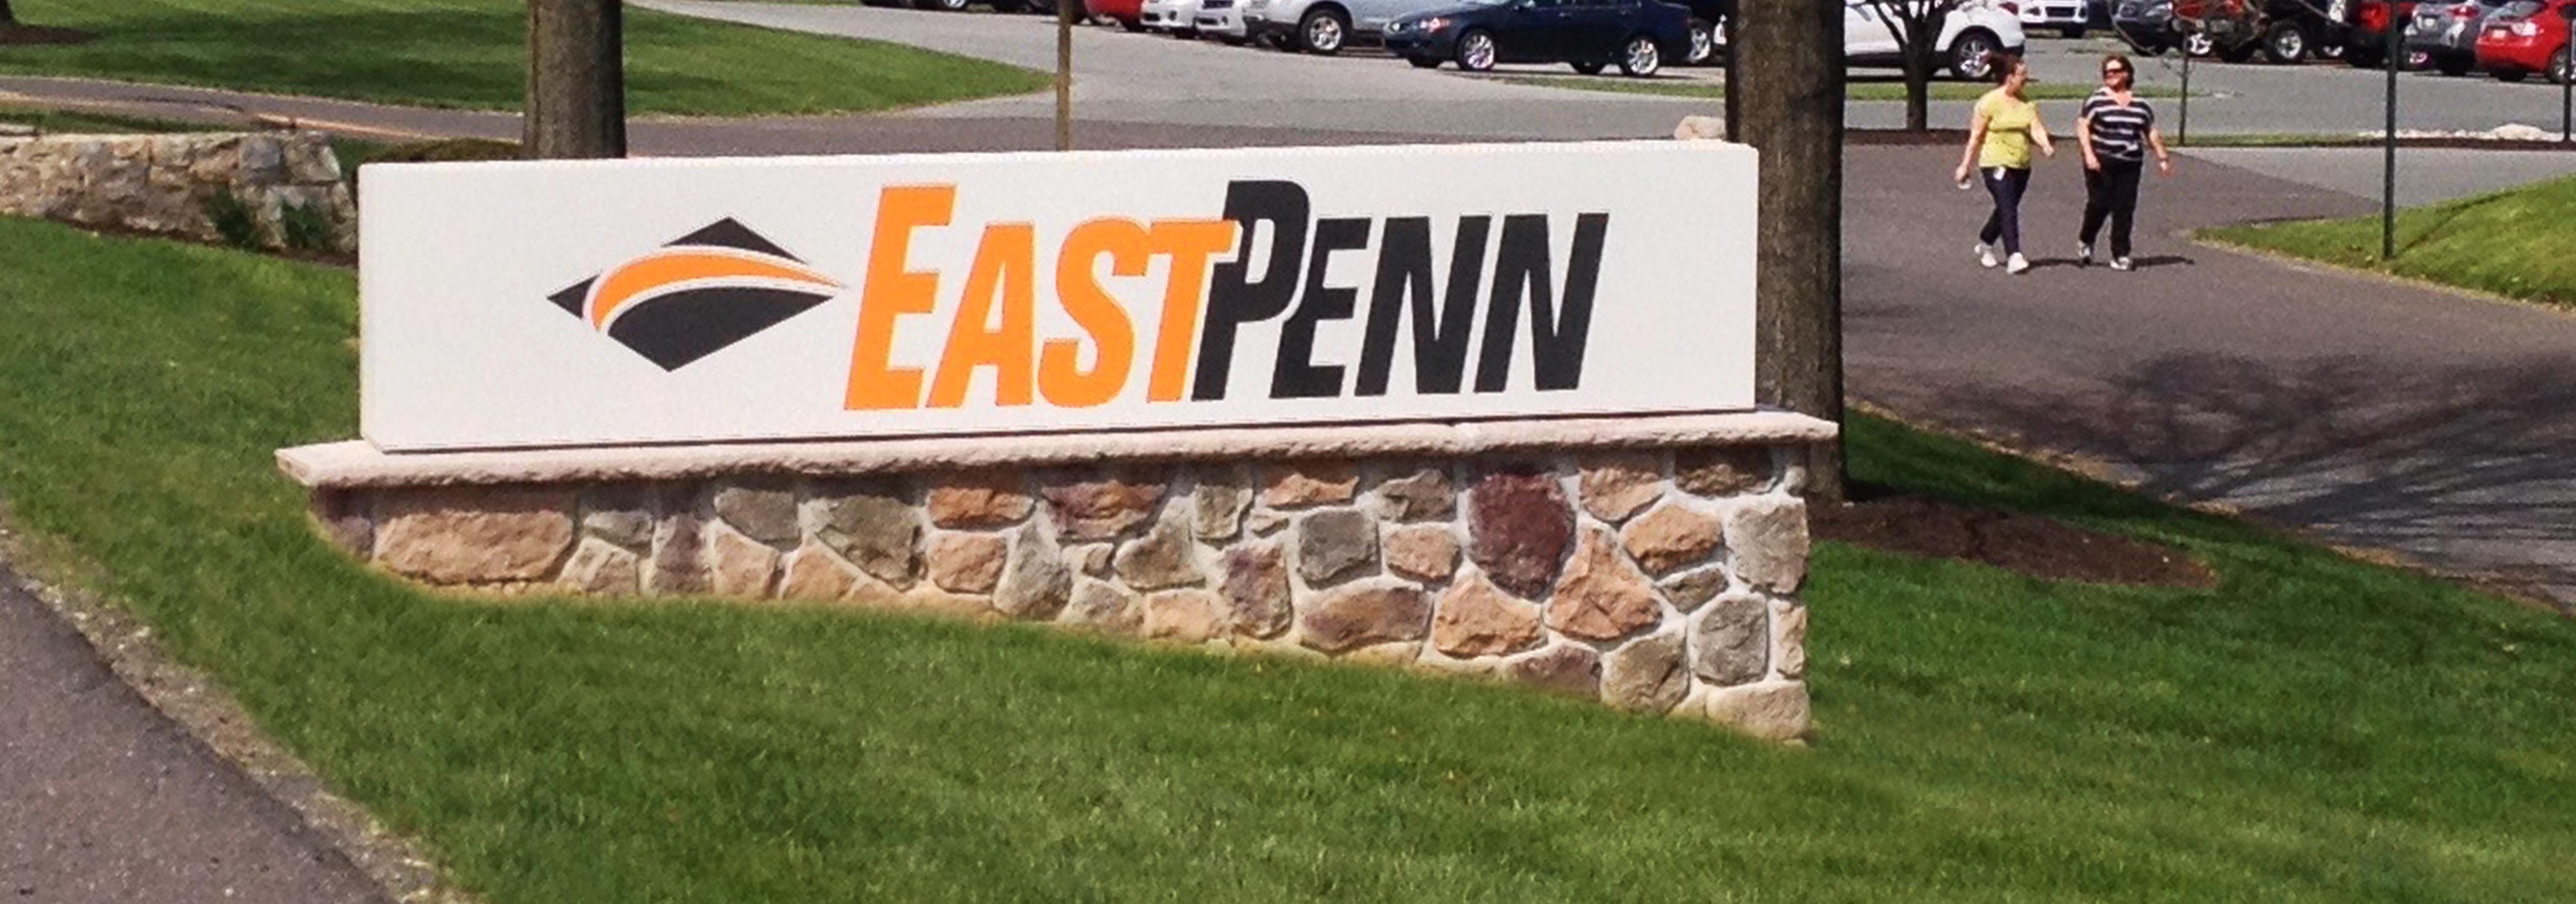 East Penn Manufacturing Logo Headquarters Signage, orange and black